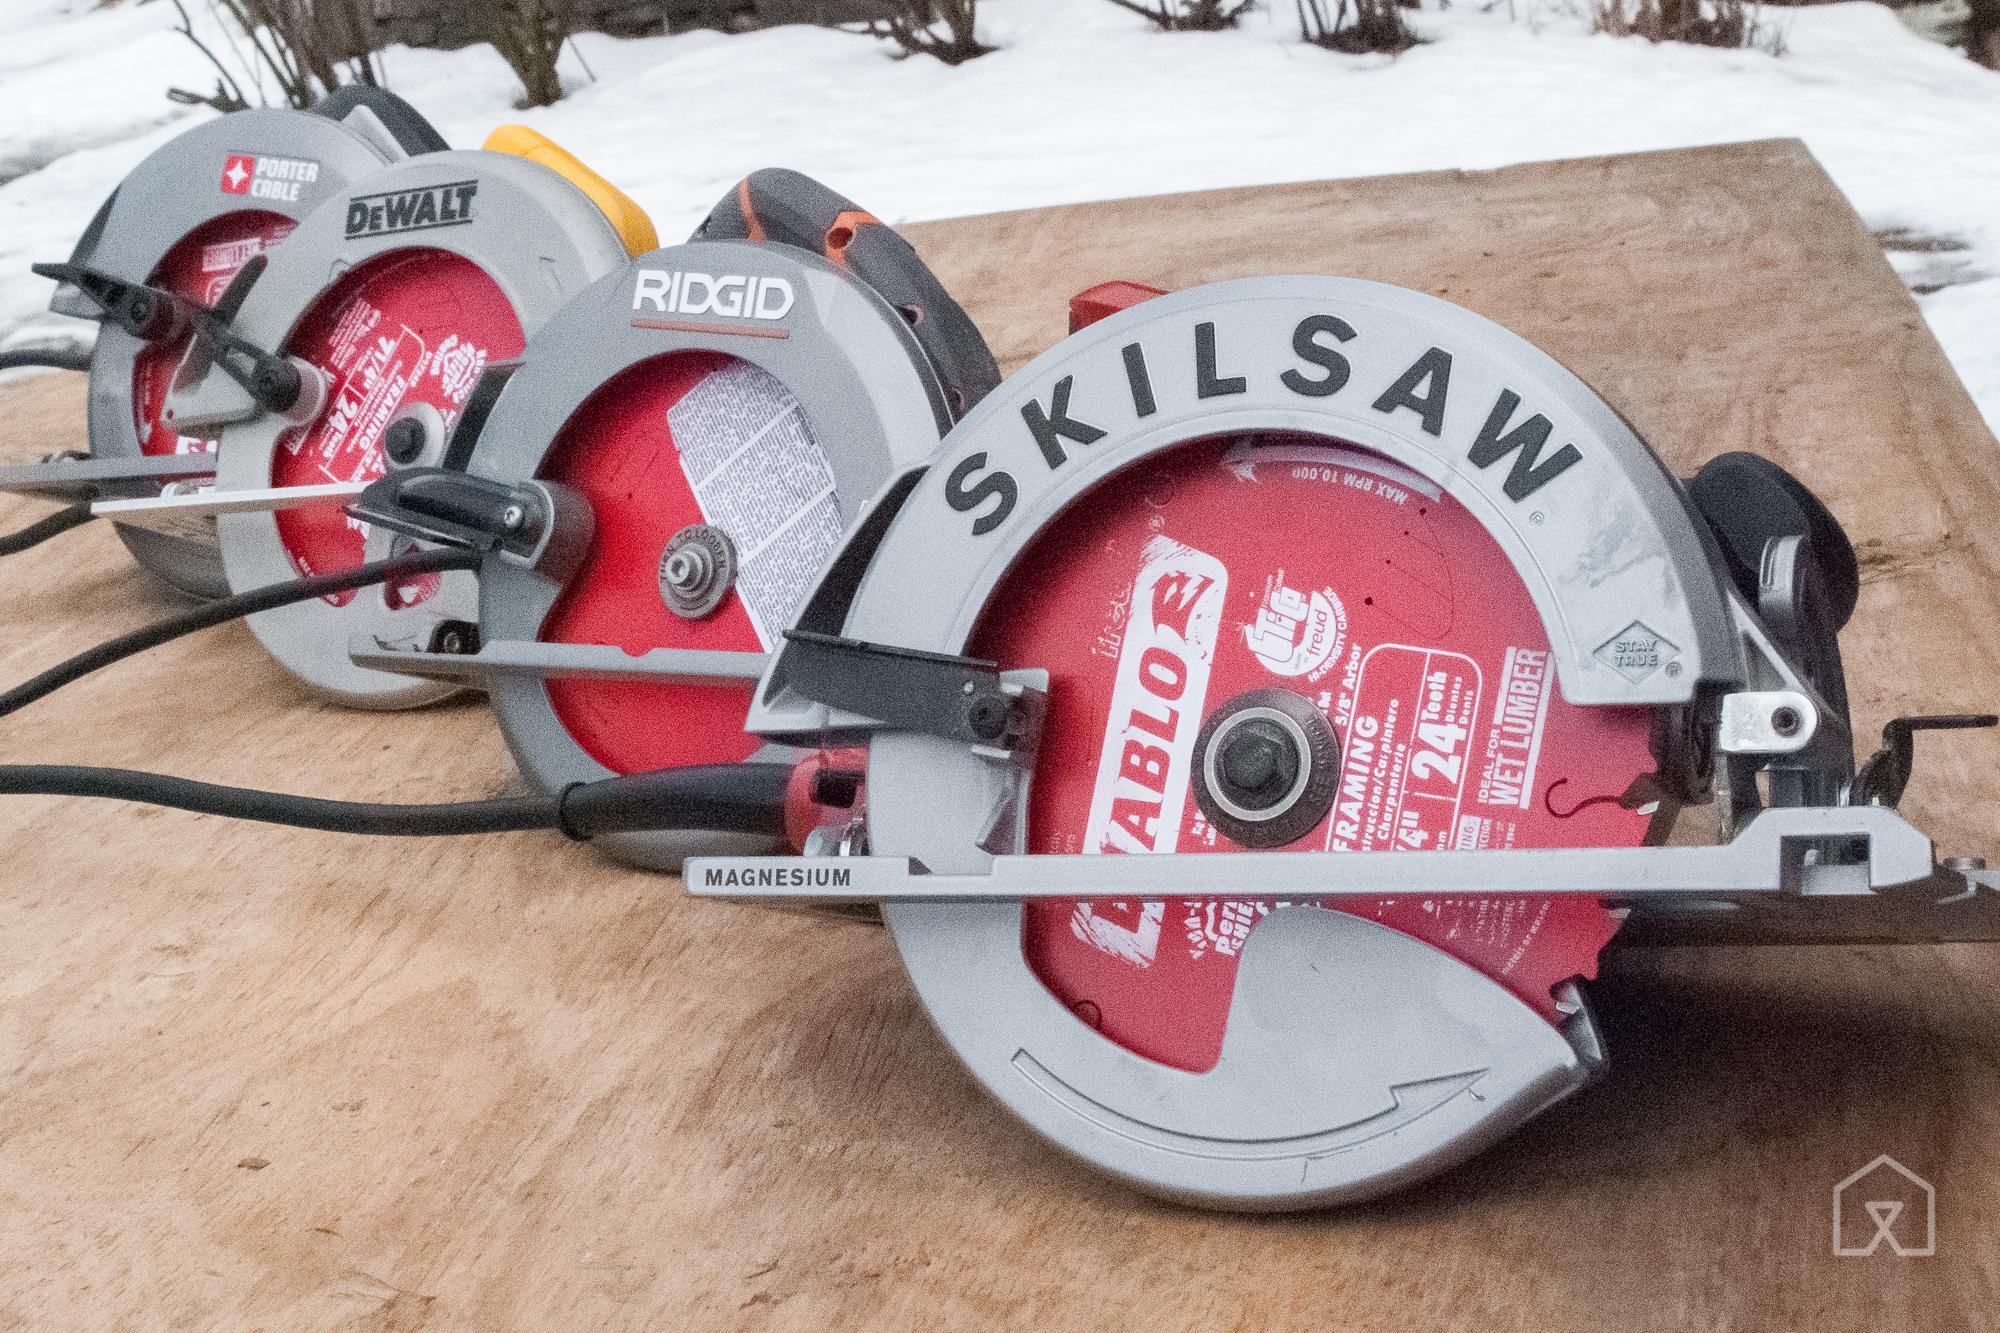 The best circular saw